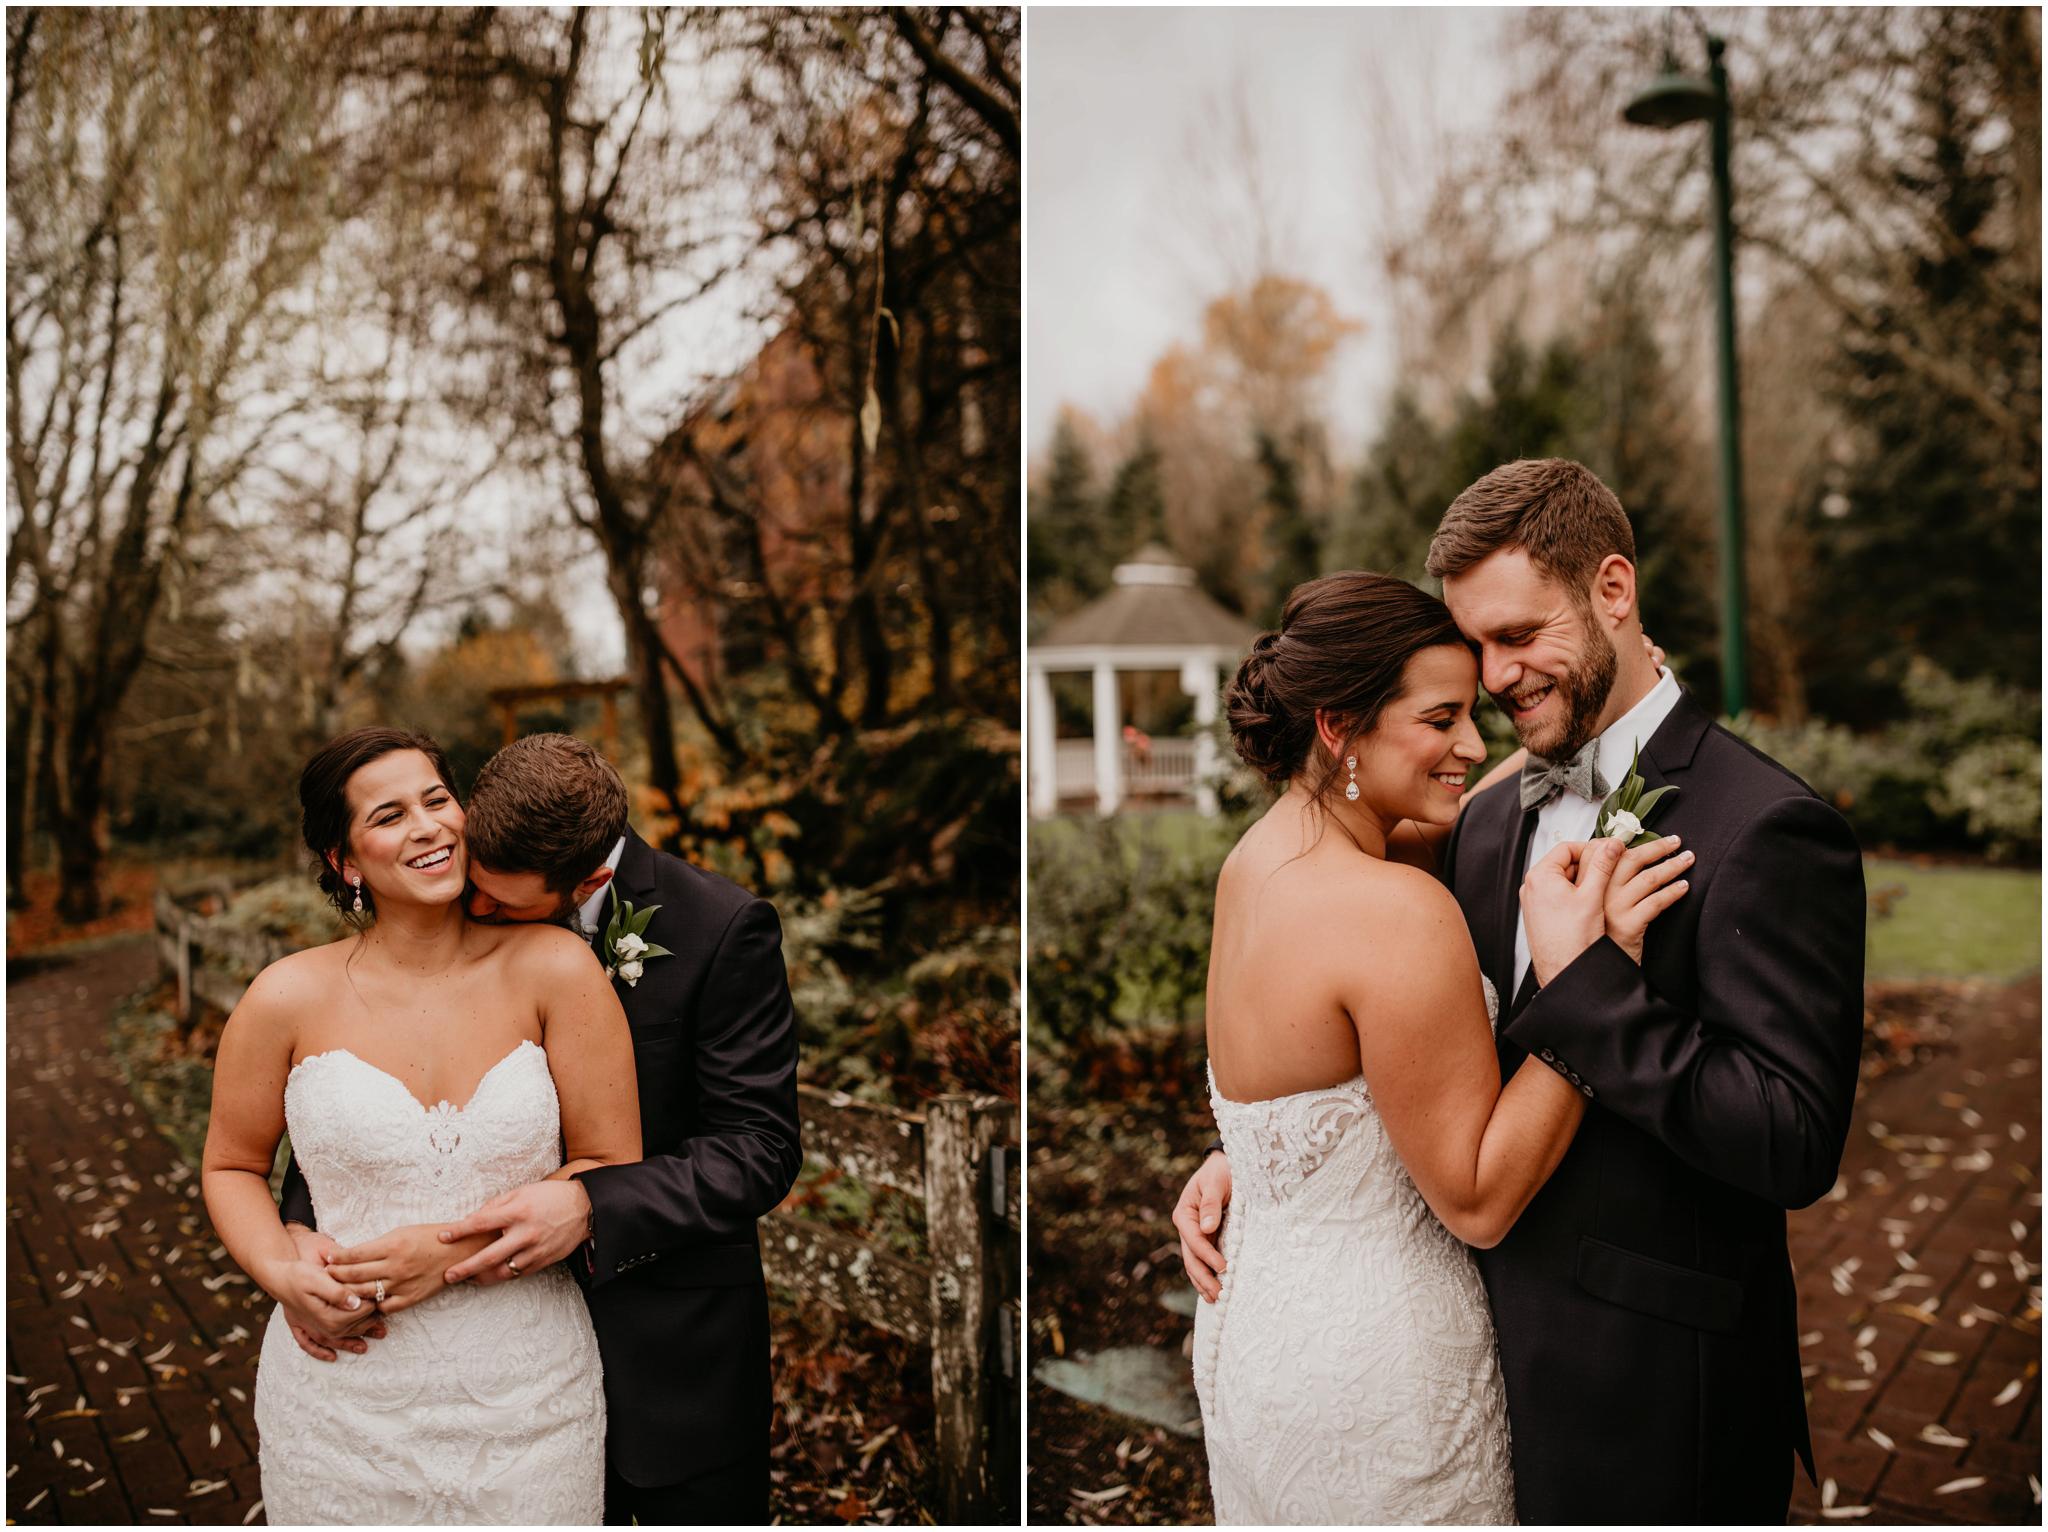 ashley-tj-the-pickering-barn-winter-wedding-seattle-photographer-029.jpg